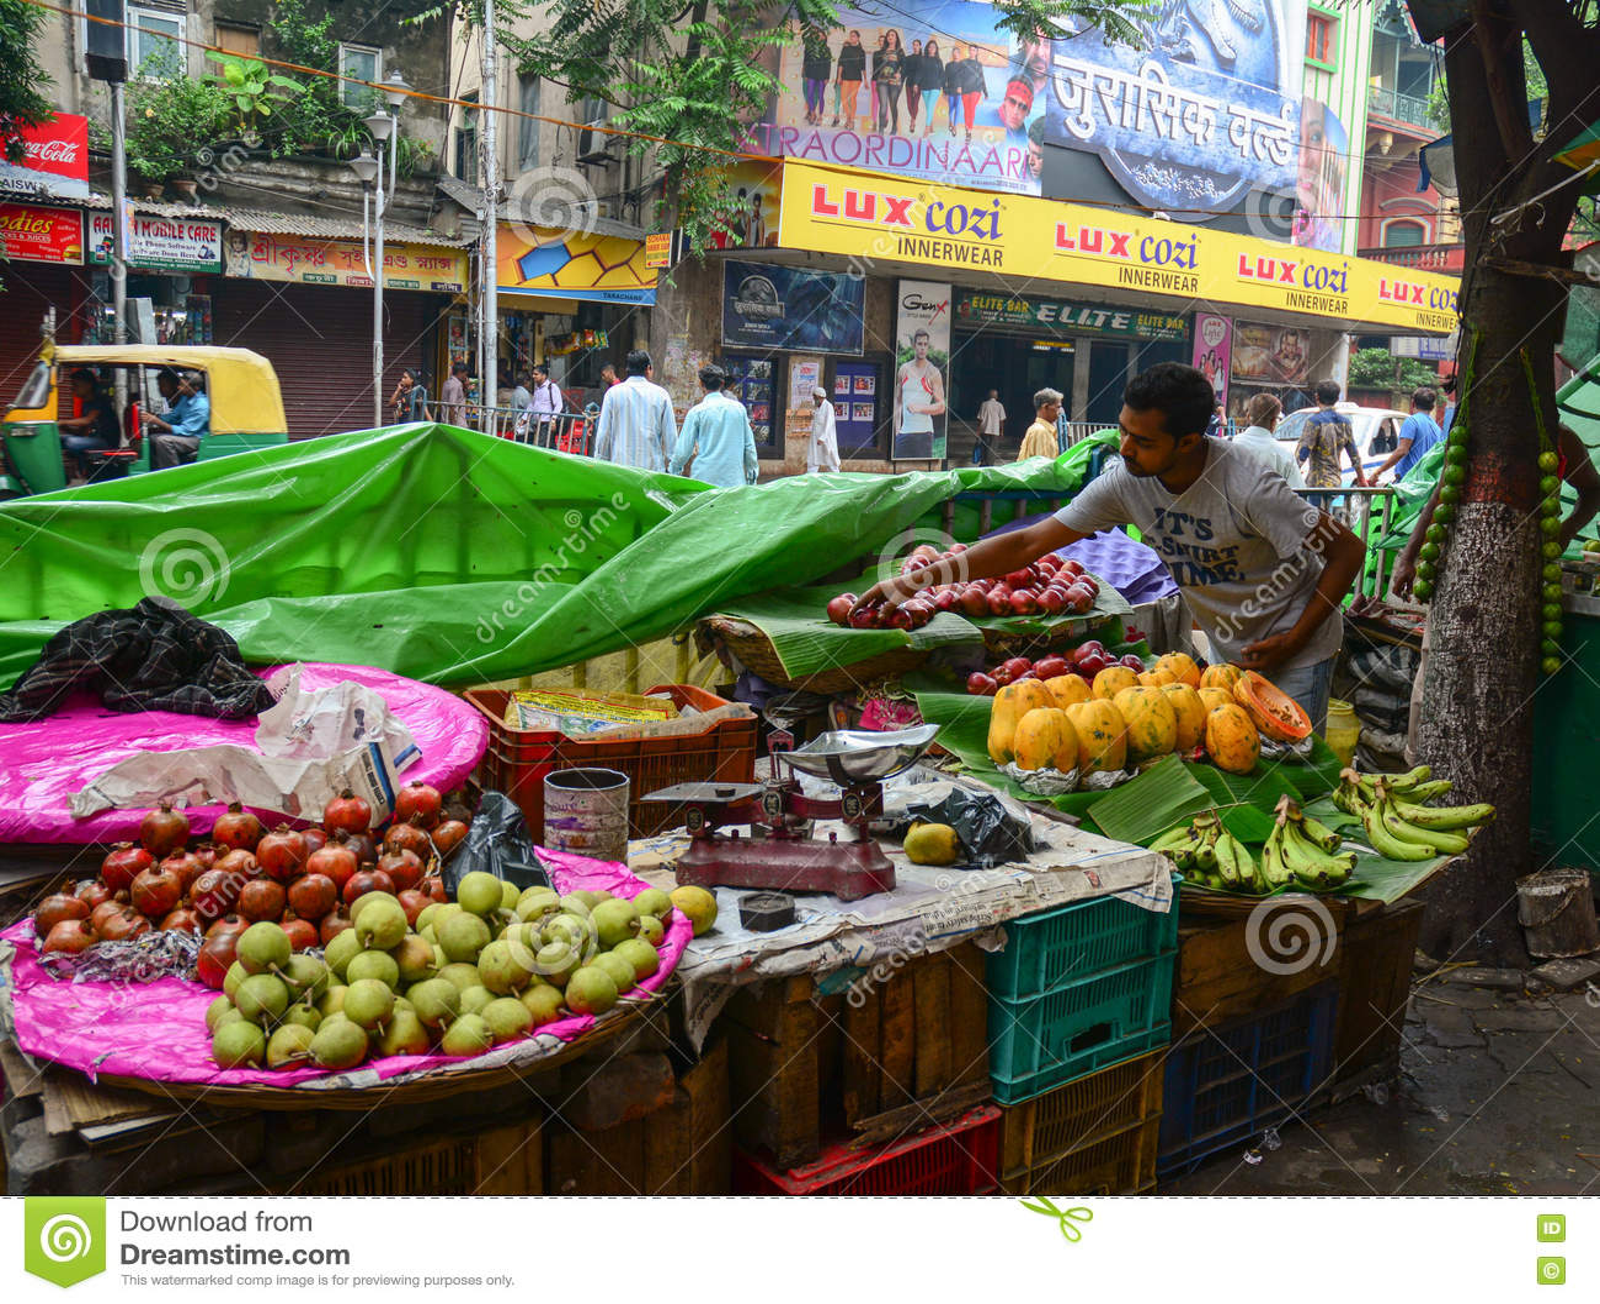 A Man Sells Fruits On Street In Kolkata, India Editorial Photo